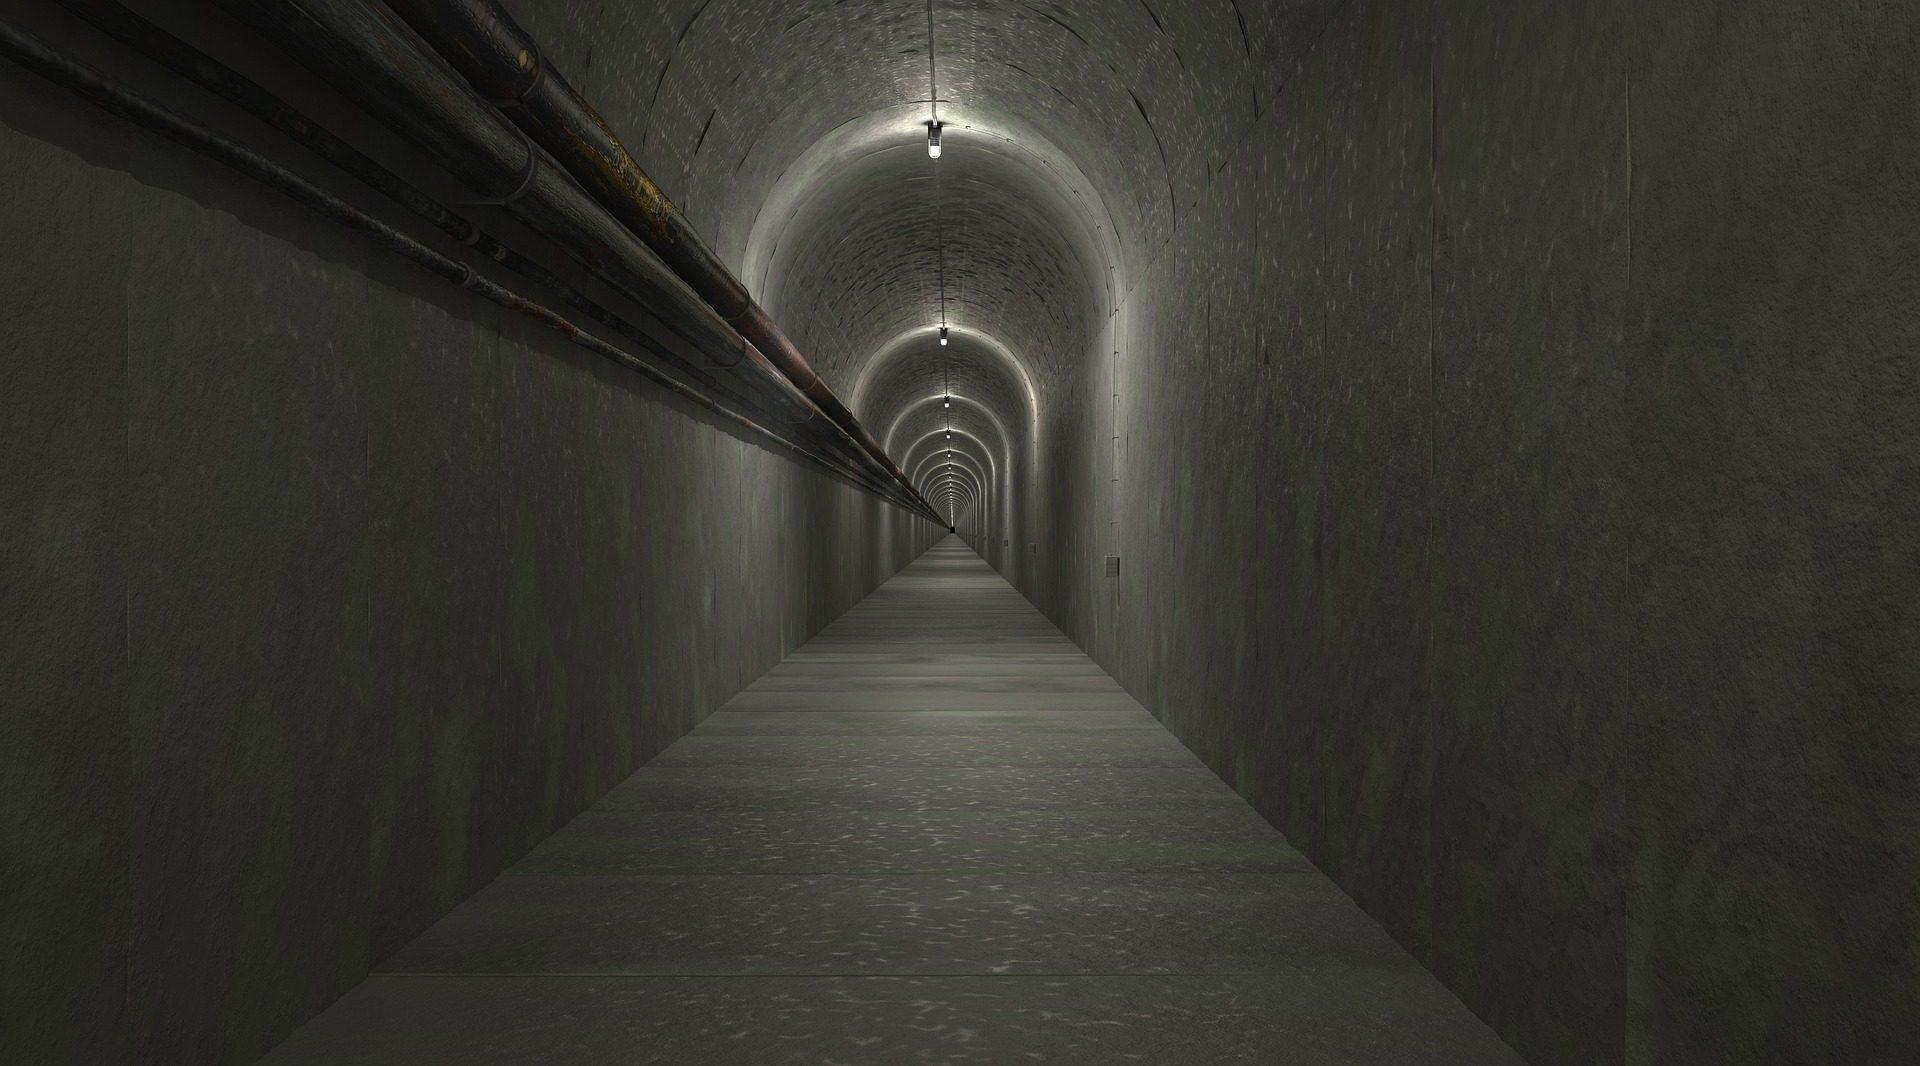 tunnel, passage, solo, Sombre, búnquer - Fonds d'écran HD - Professor-falken.com